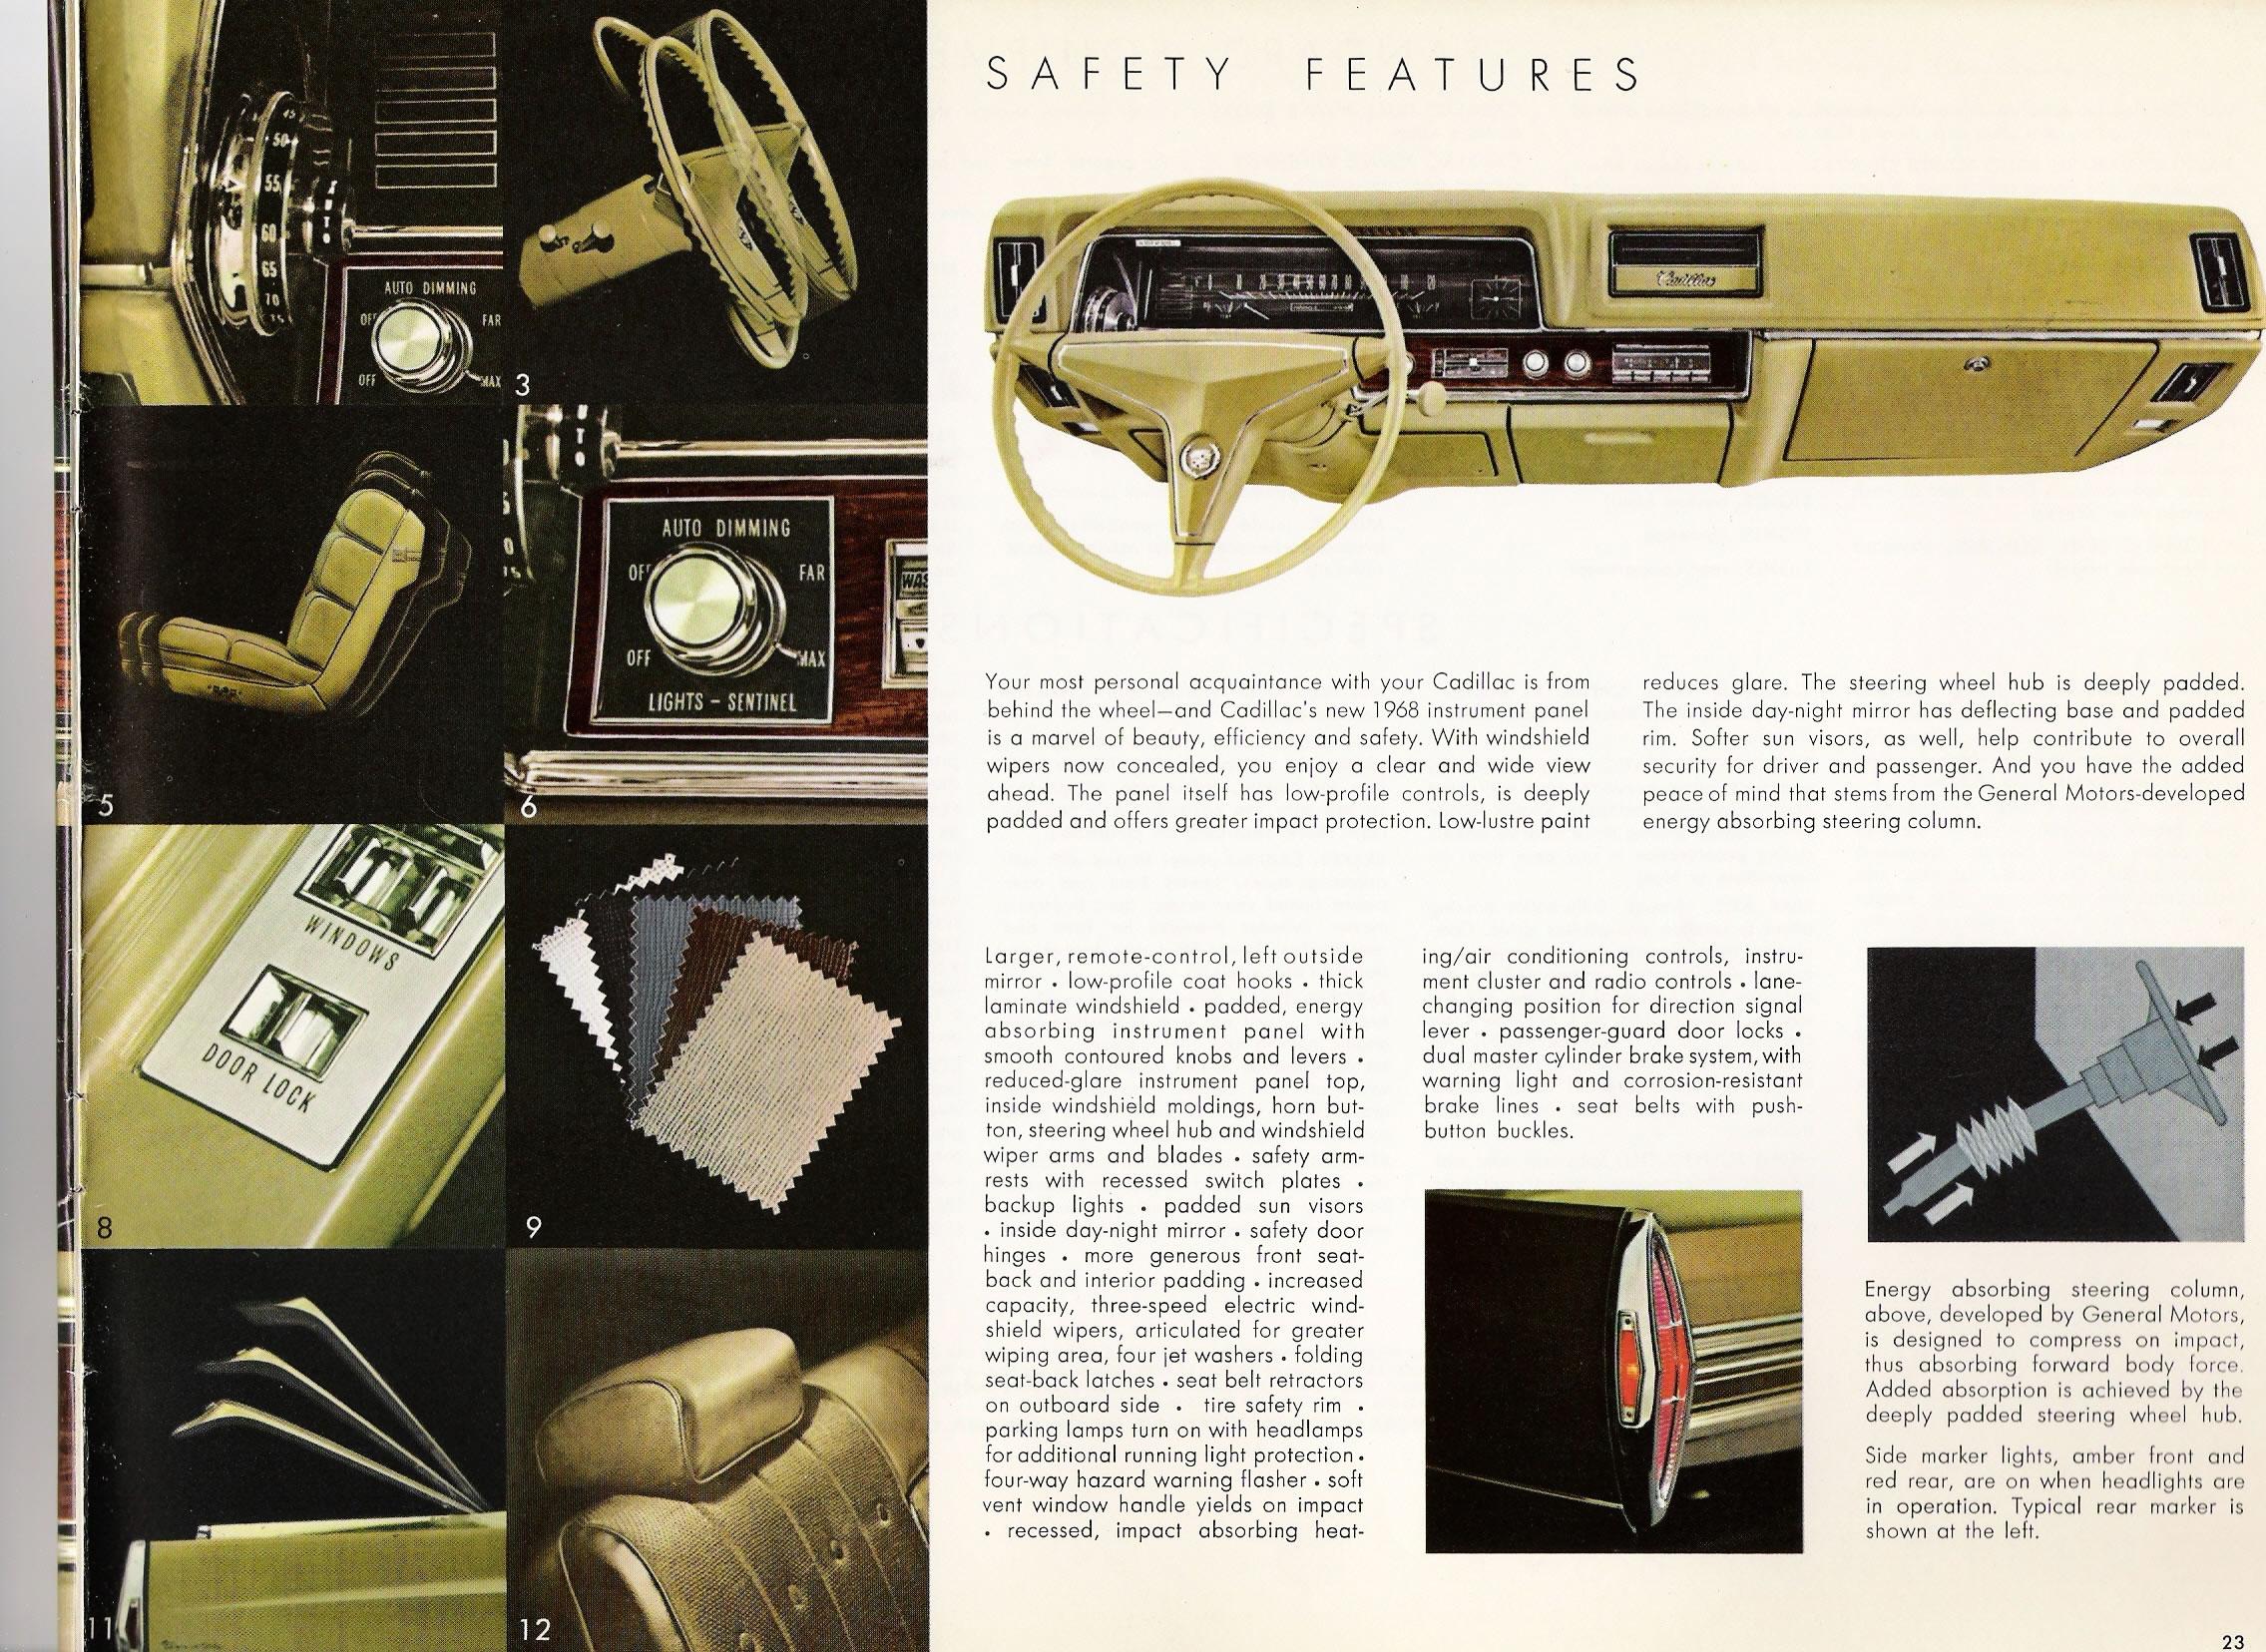 1968 Cadillac Brochure / 1968 cadillac 18.jpg